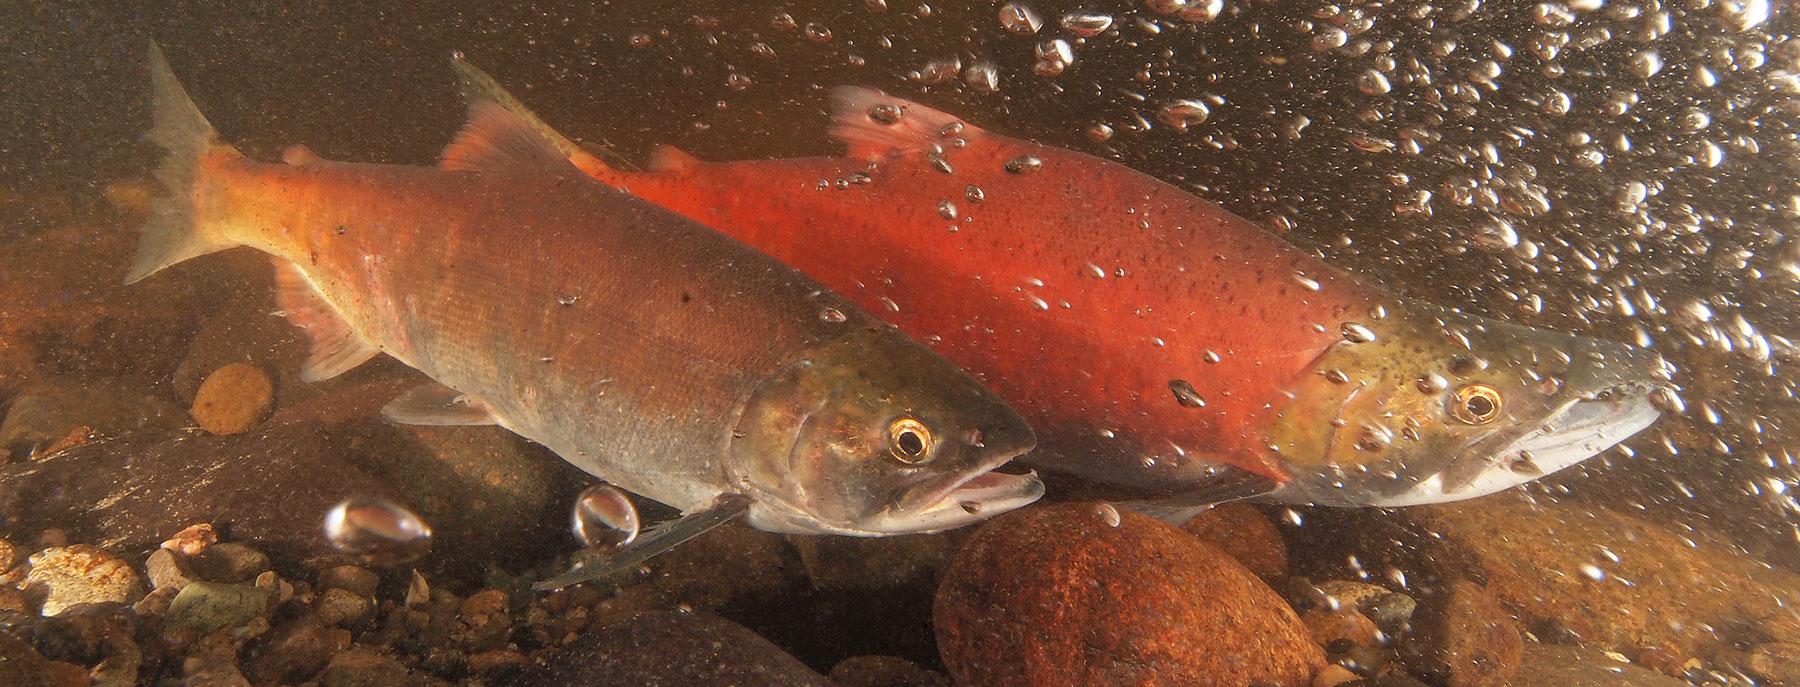 Kokanee salmon | Oregon Department of Fish & Wildlife